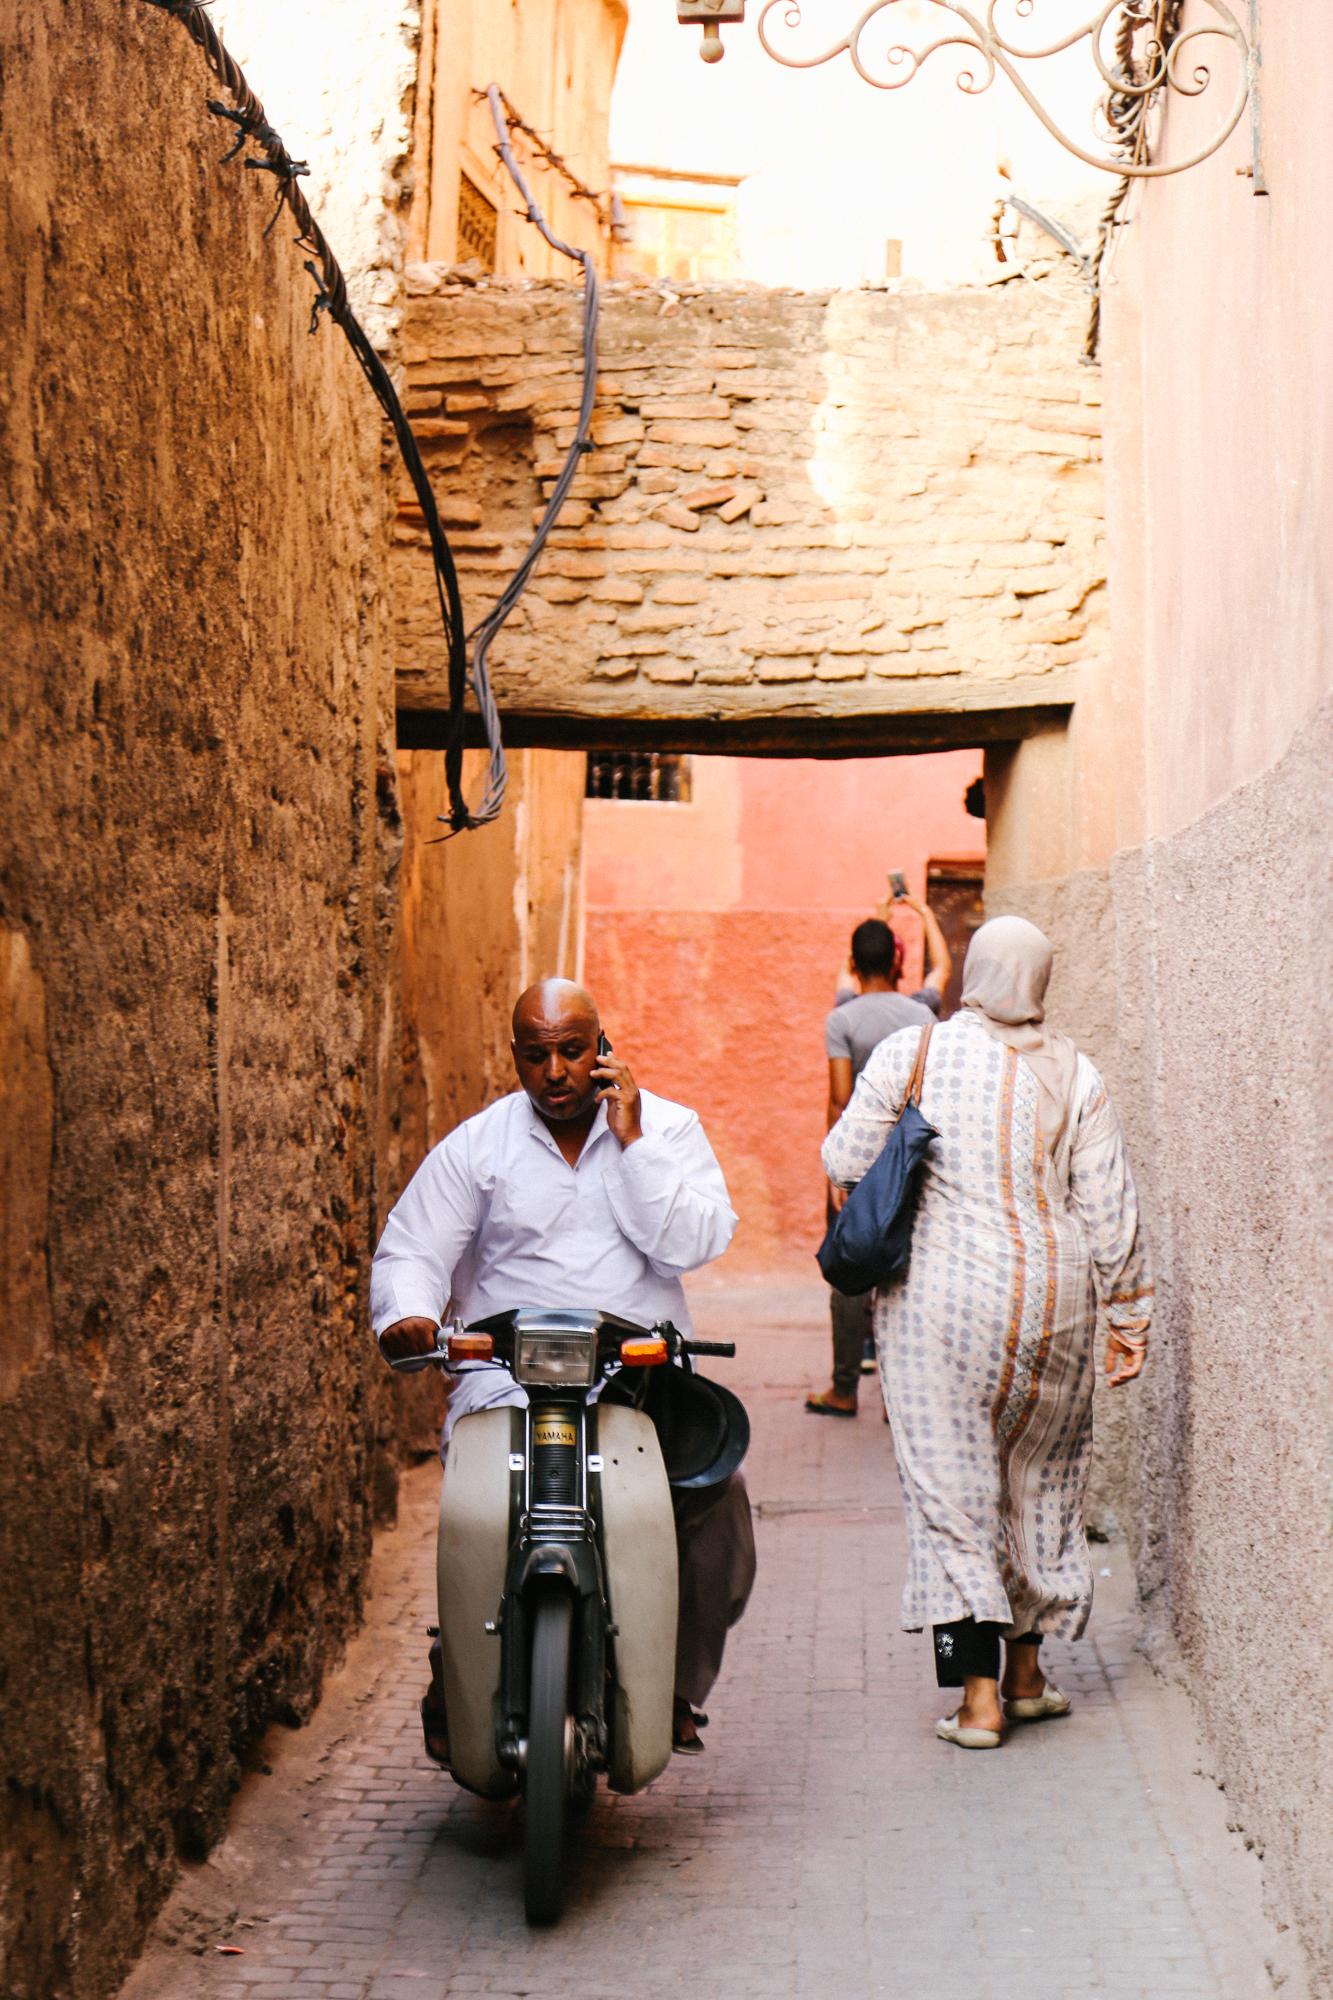 Spiritedpursuit_leelitumbe_marrakech_morocco-1-16.jpg